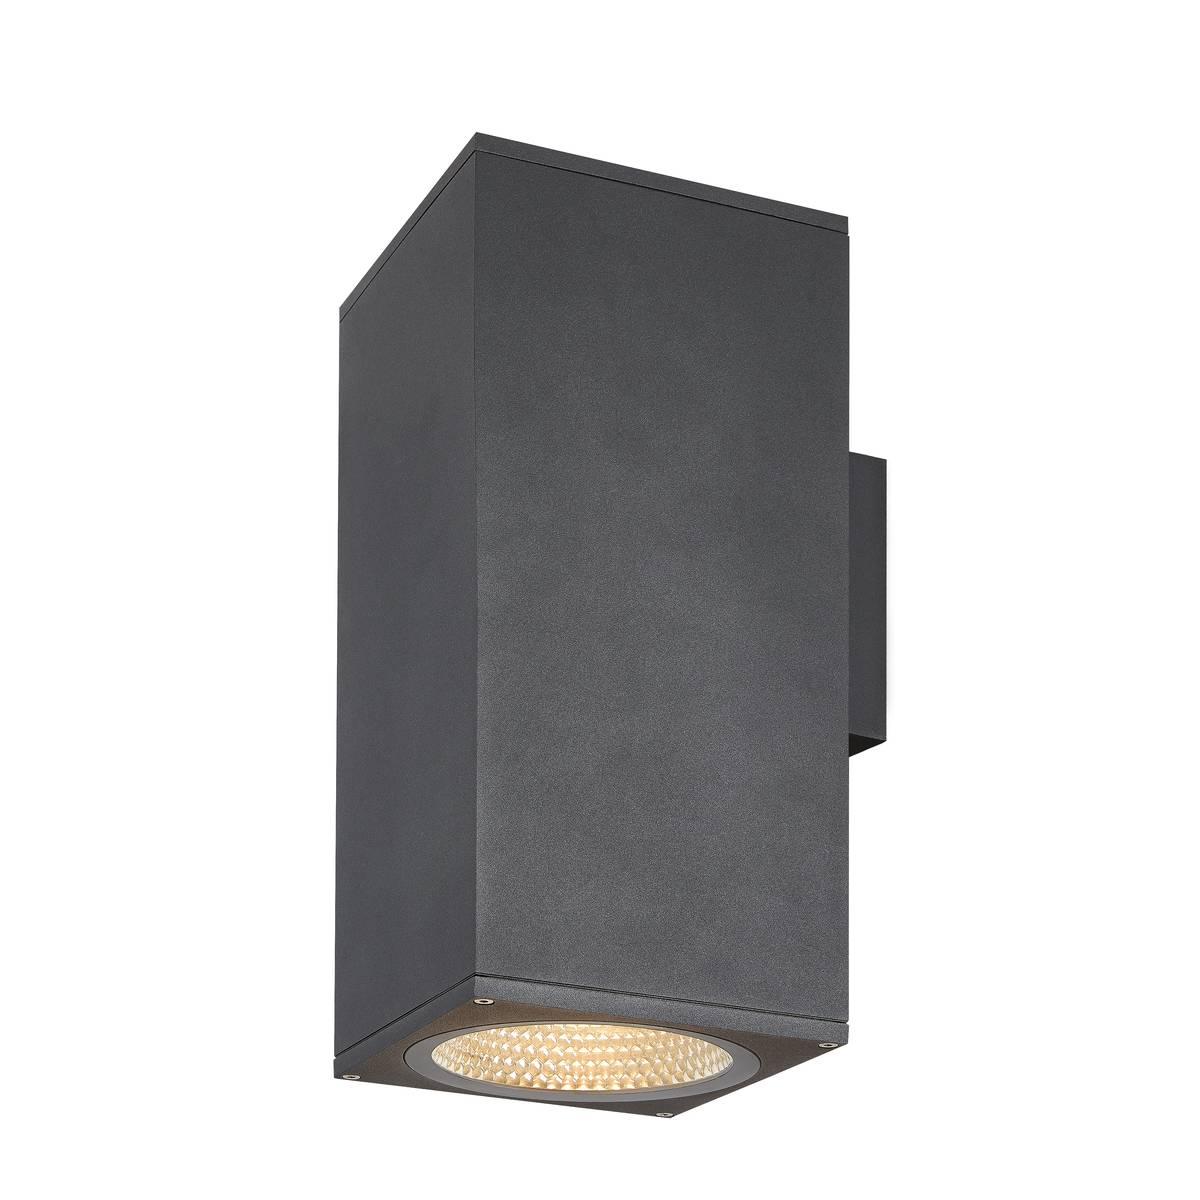 SLV buiten wandlamp Enola Square Up/Down L - antraciet